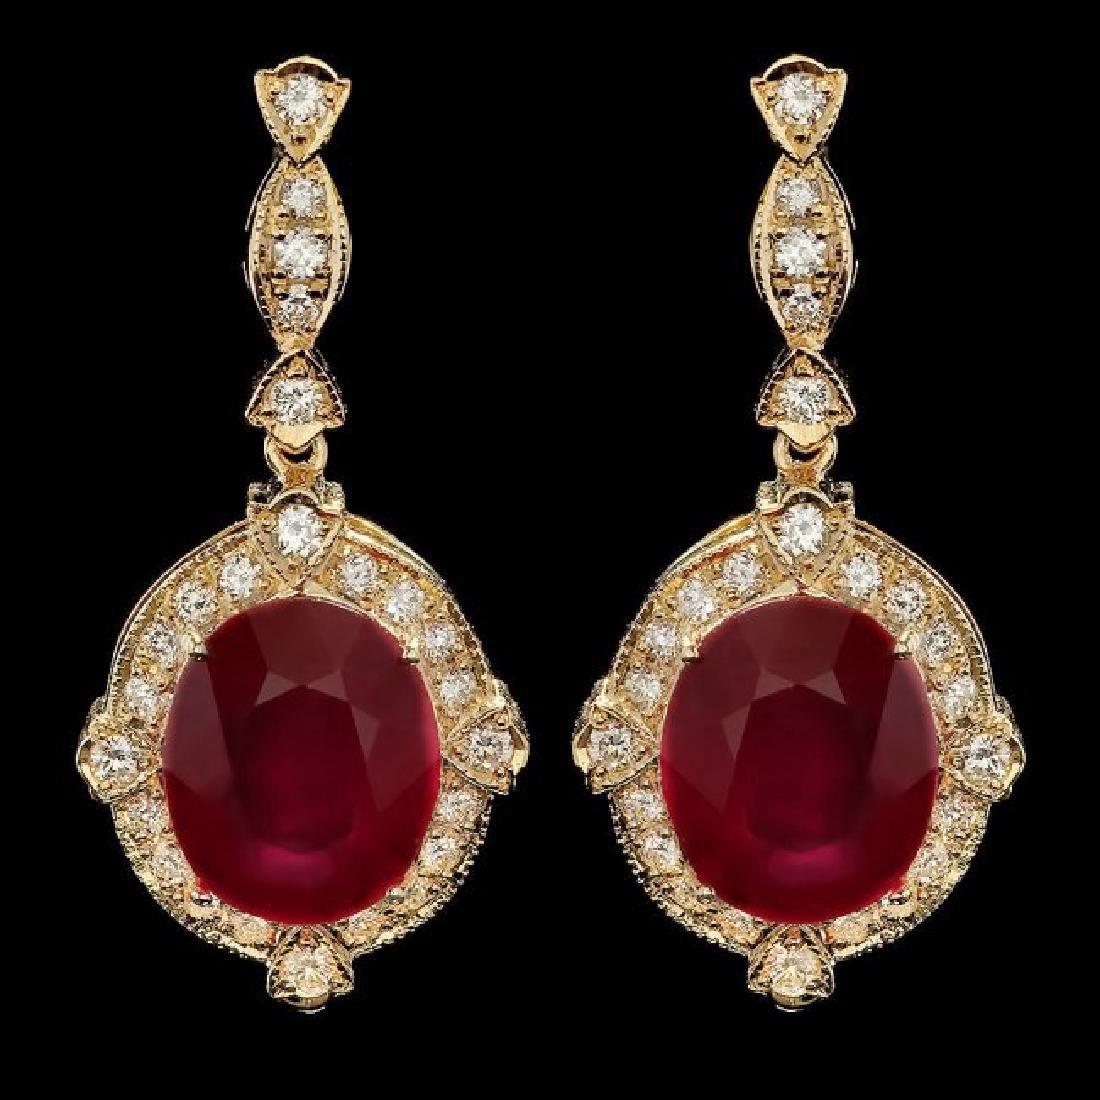 14k Gold 22.50ct Ruby 1.70ct Diamond Earrings